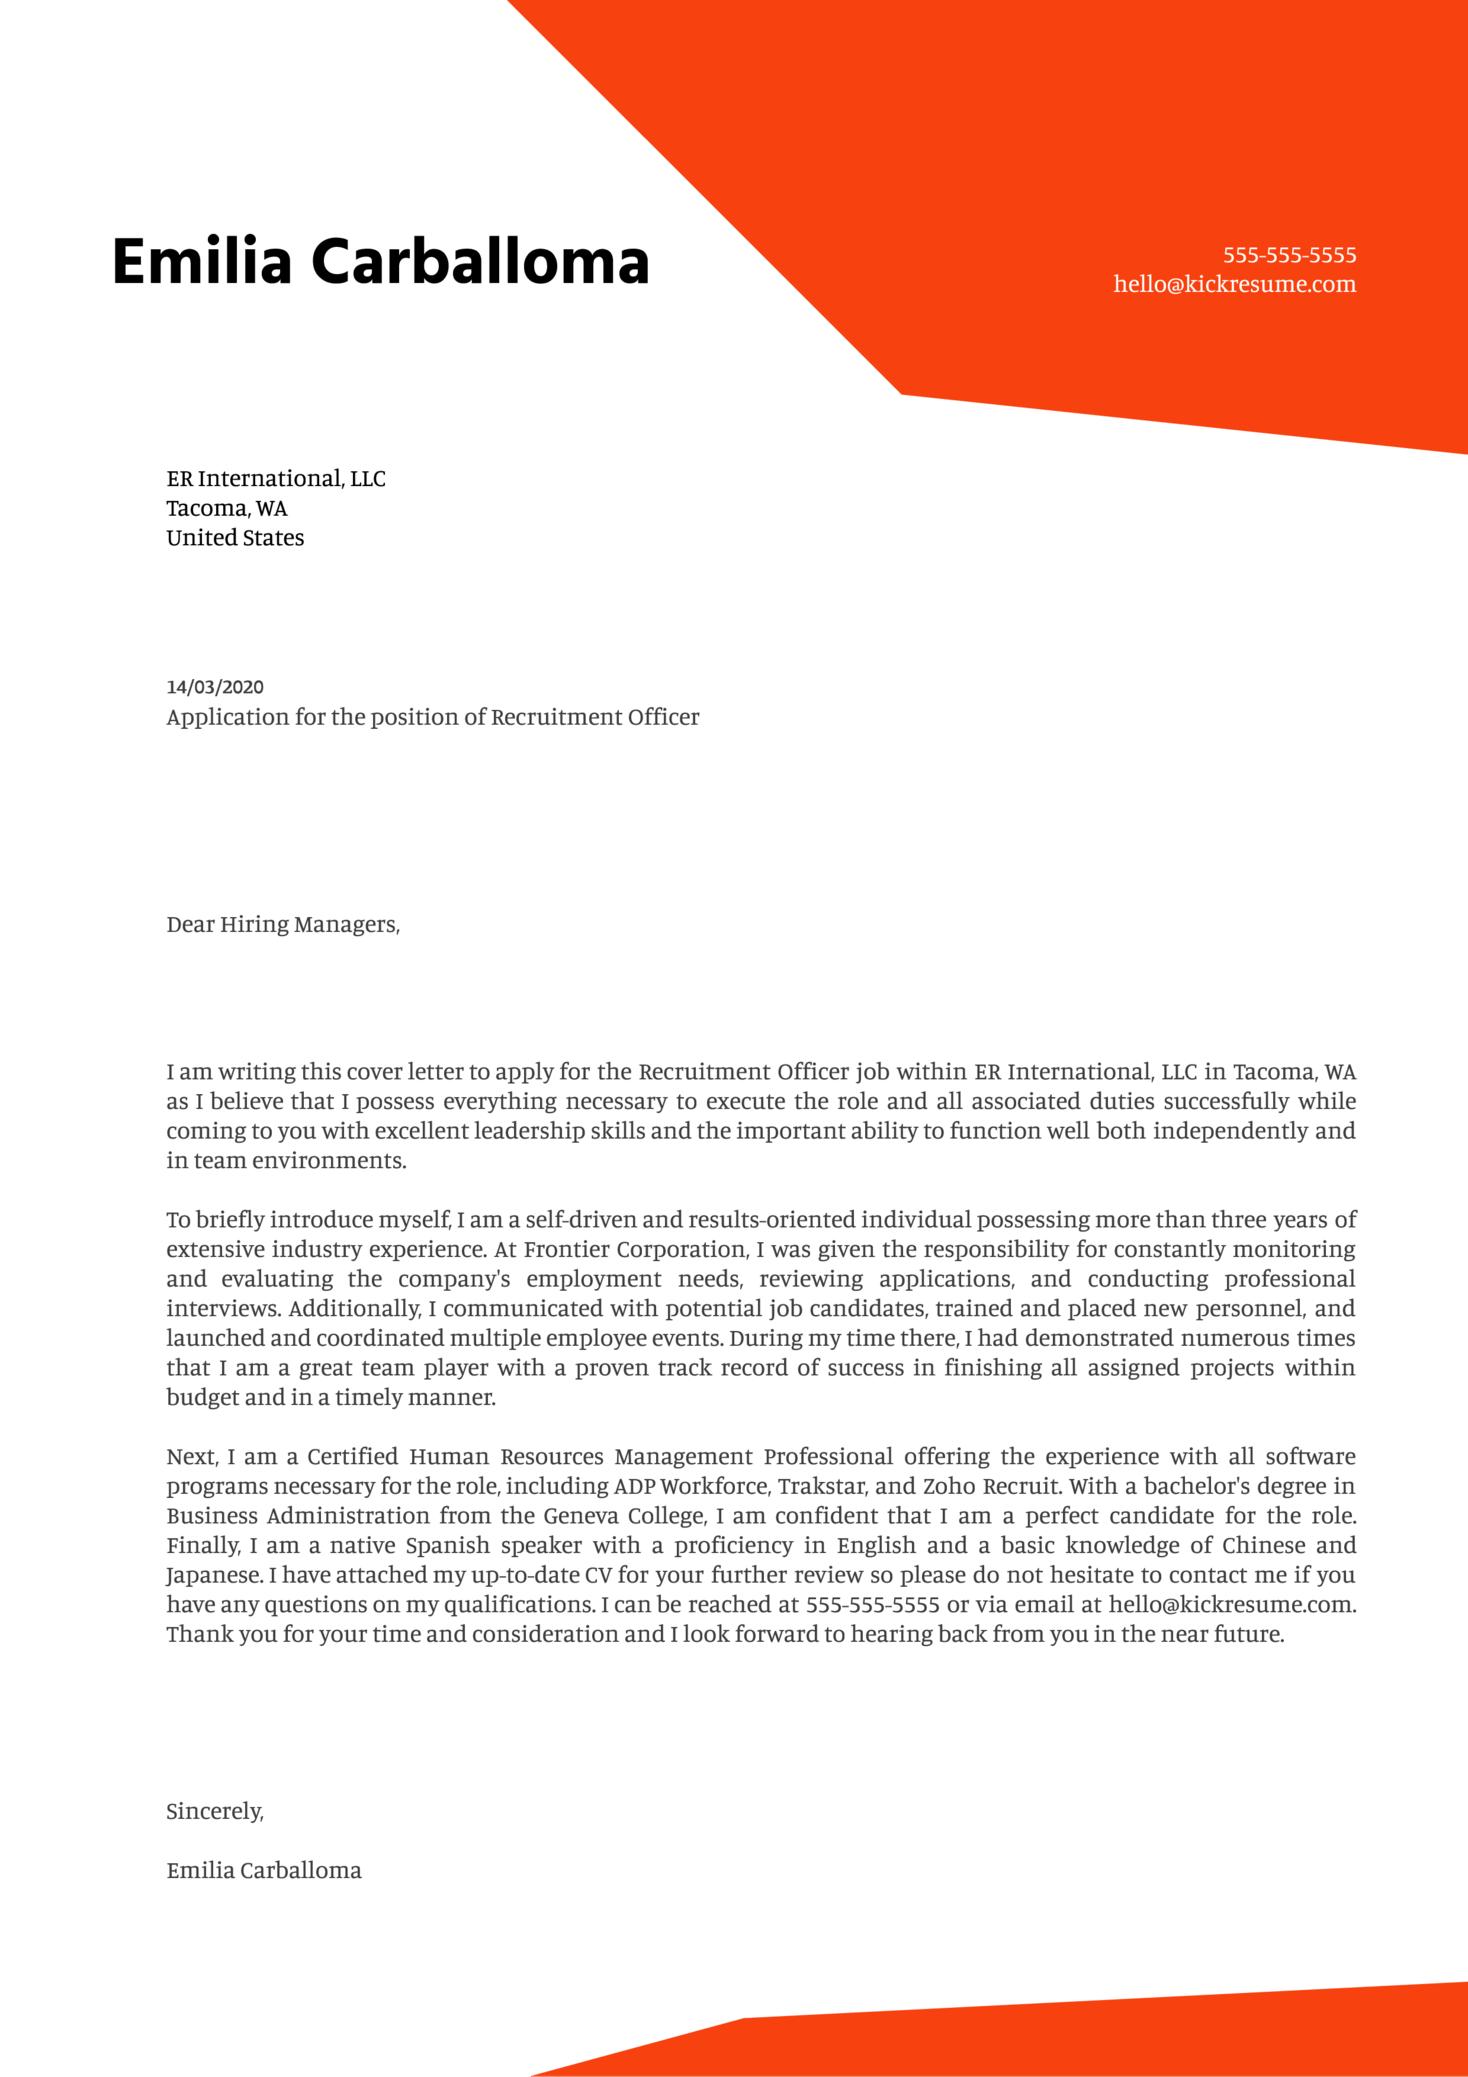 Recruitment Officer Cover Letter Example